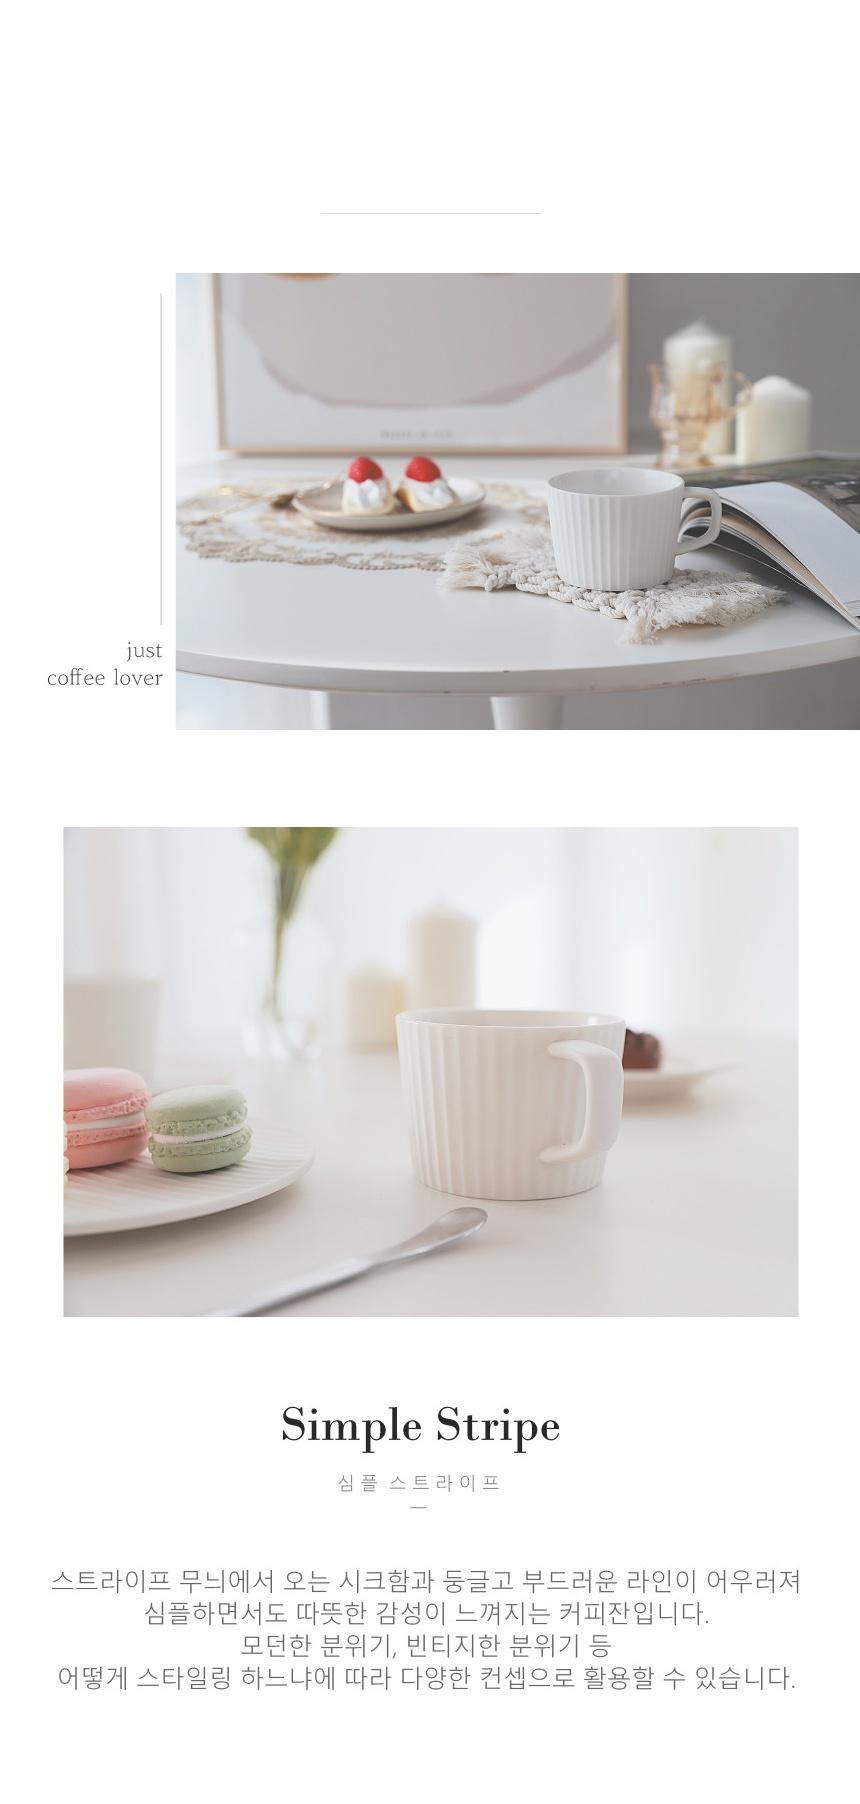 white_basic_cup_02.jpg